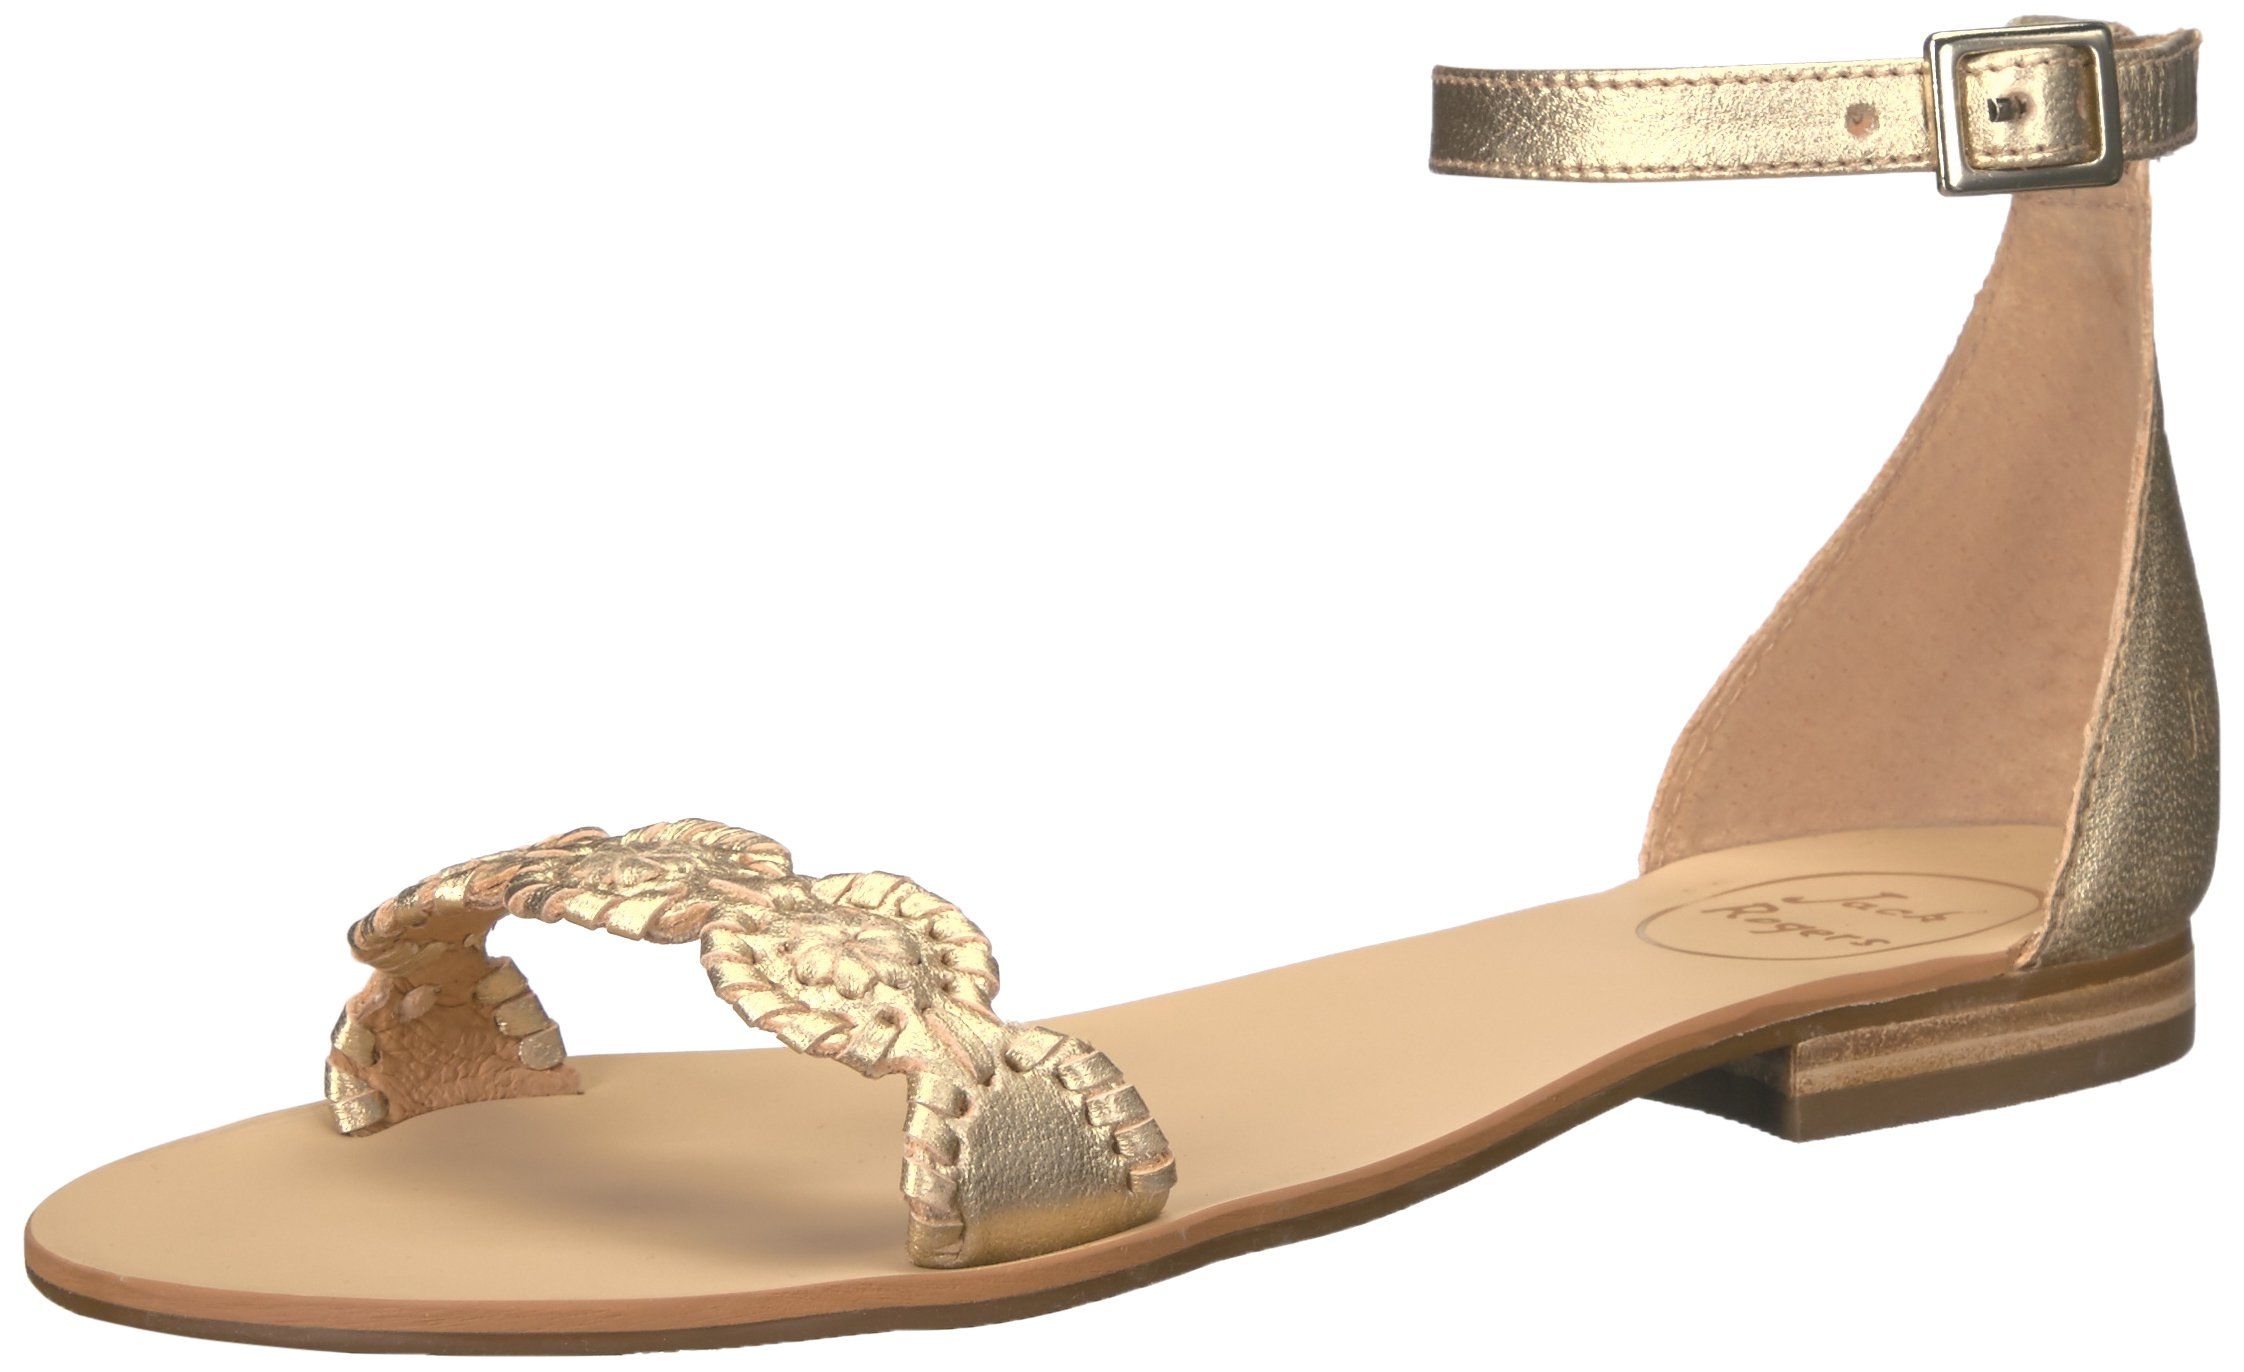 Jack Rogers Women's Daphne Dress Sandal, Gold, 9 M US